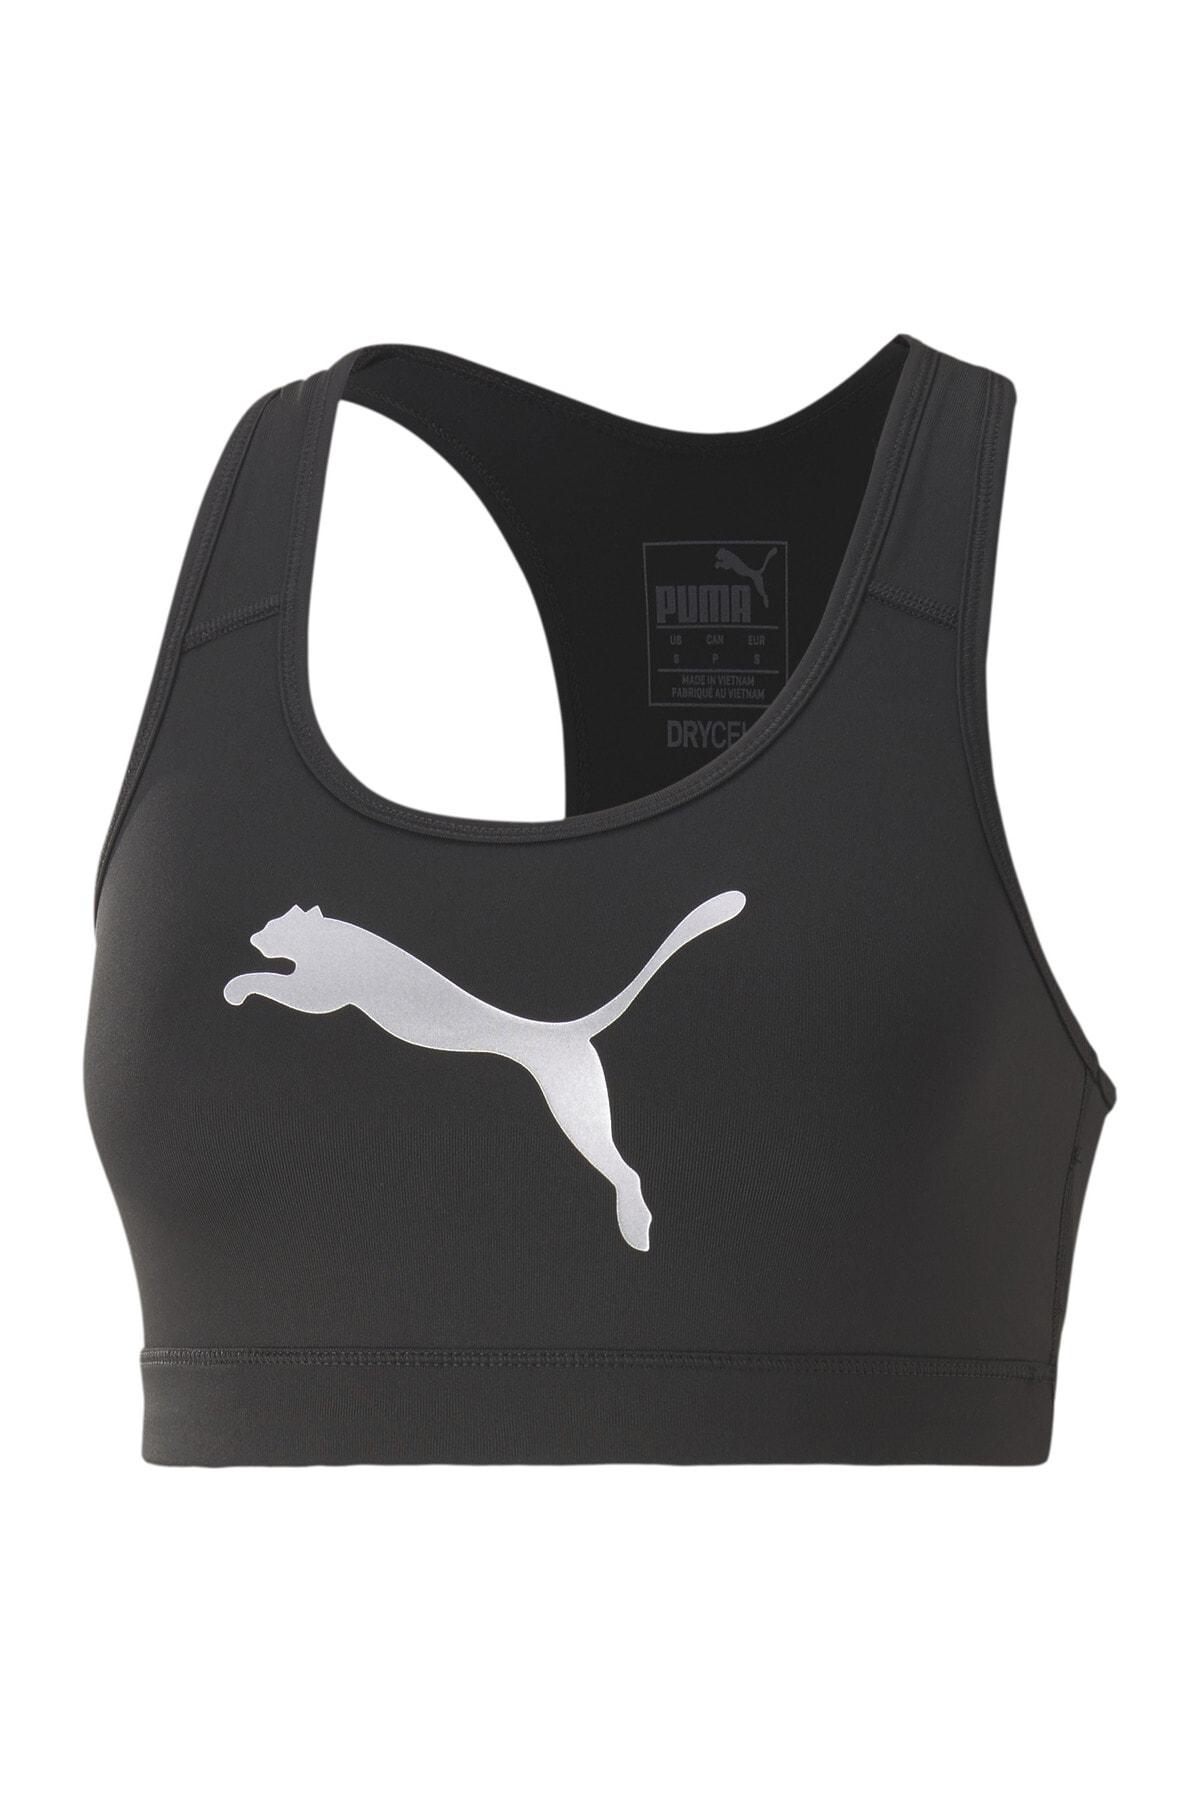 Puma Kadın Spor Sütyeni - 4Keeps - 51915814 3